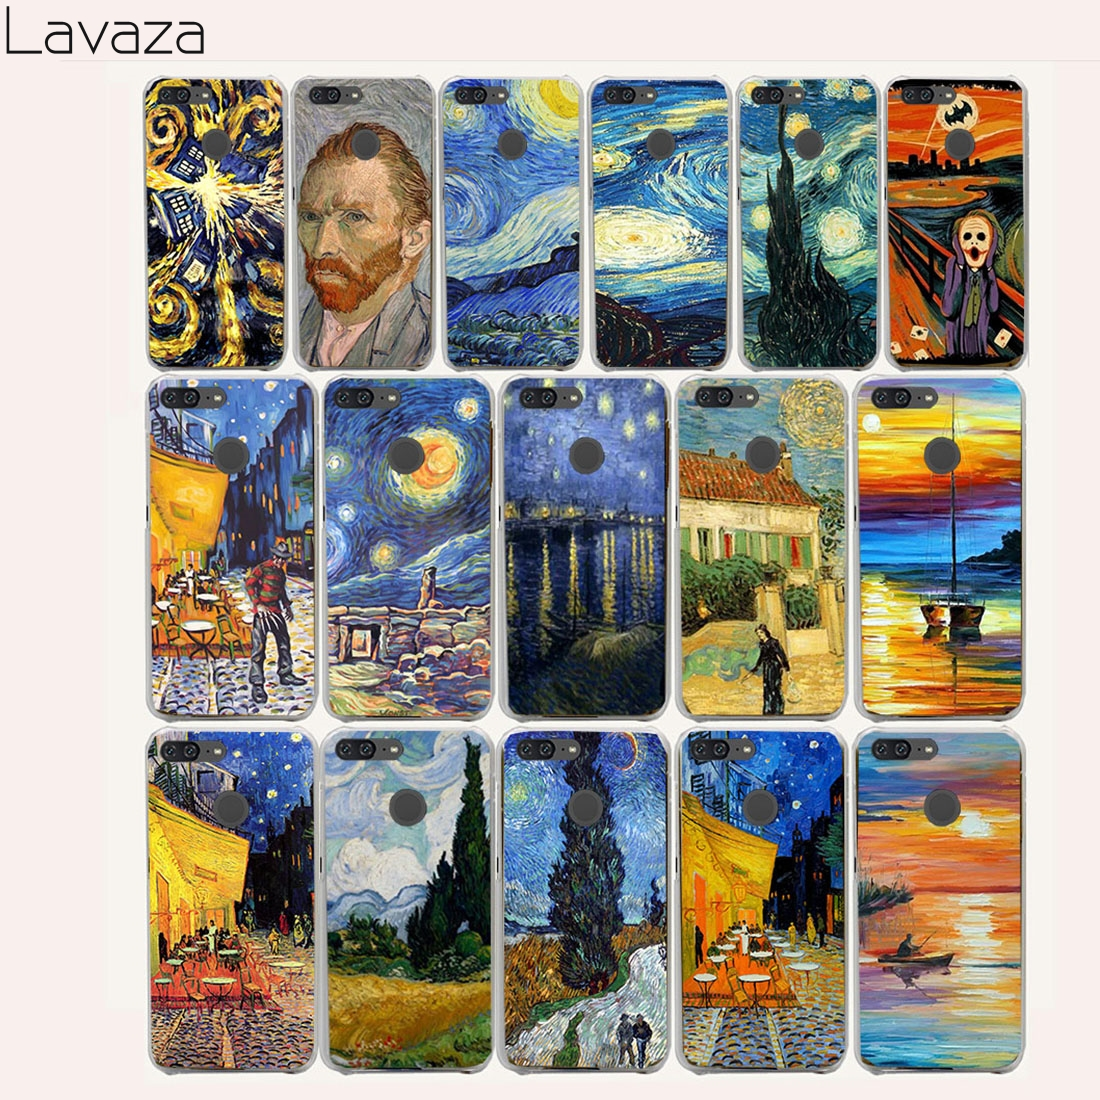 Lavaza 995CA Doctor who van gogh Art Hard Case for Huawei Y7 Y6 Y5 Y3 2017 G7 Y3II Y5II Y6II Honor 9 8 lite 6a 7x